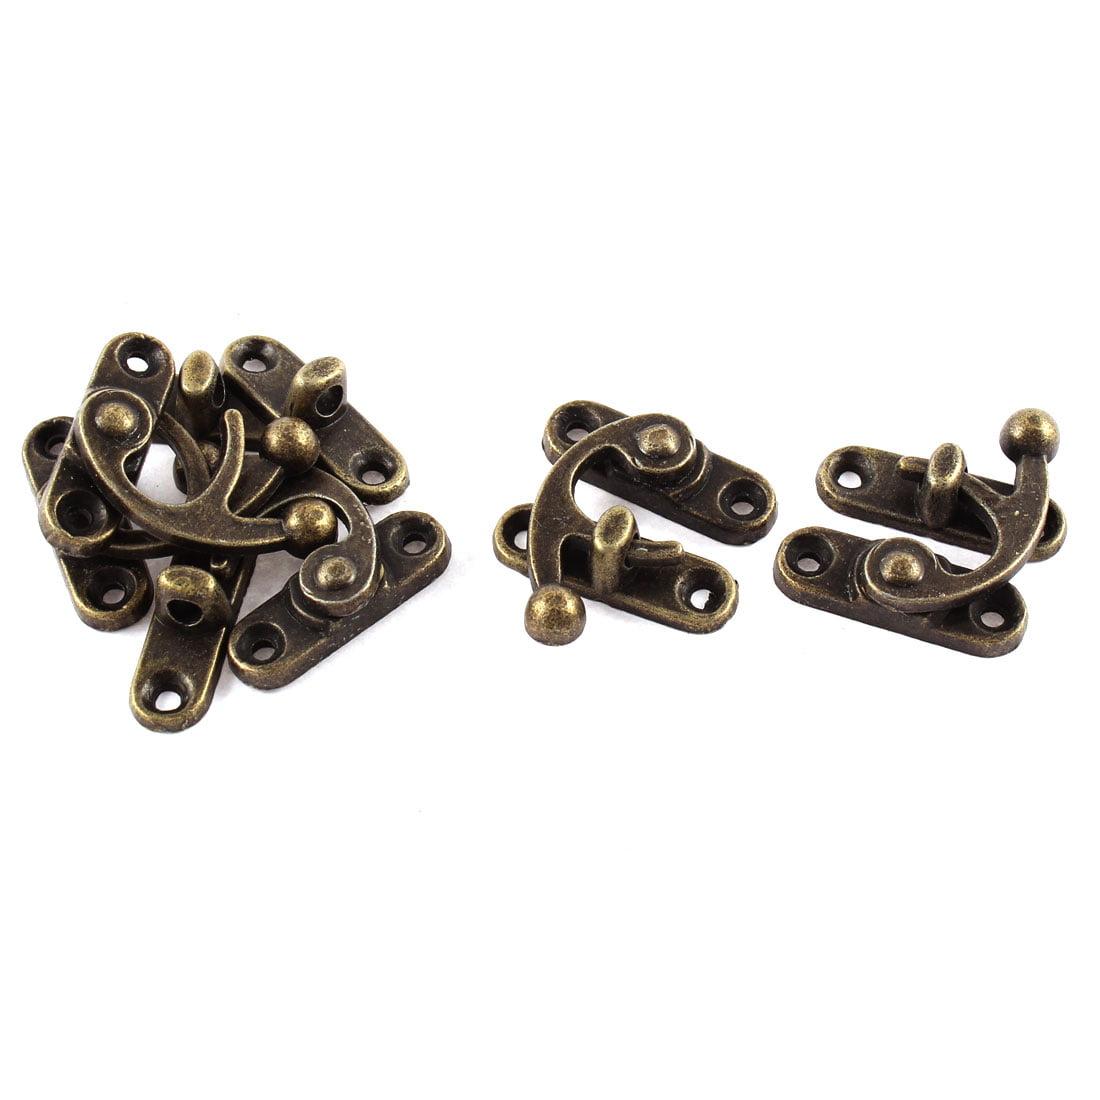 5pcs 33mmx29mm Antique Style Jewelry Cigar Box Hasp Hook Lock Latch